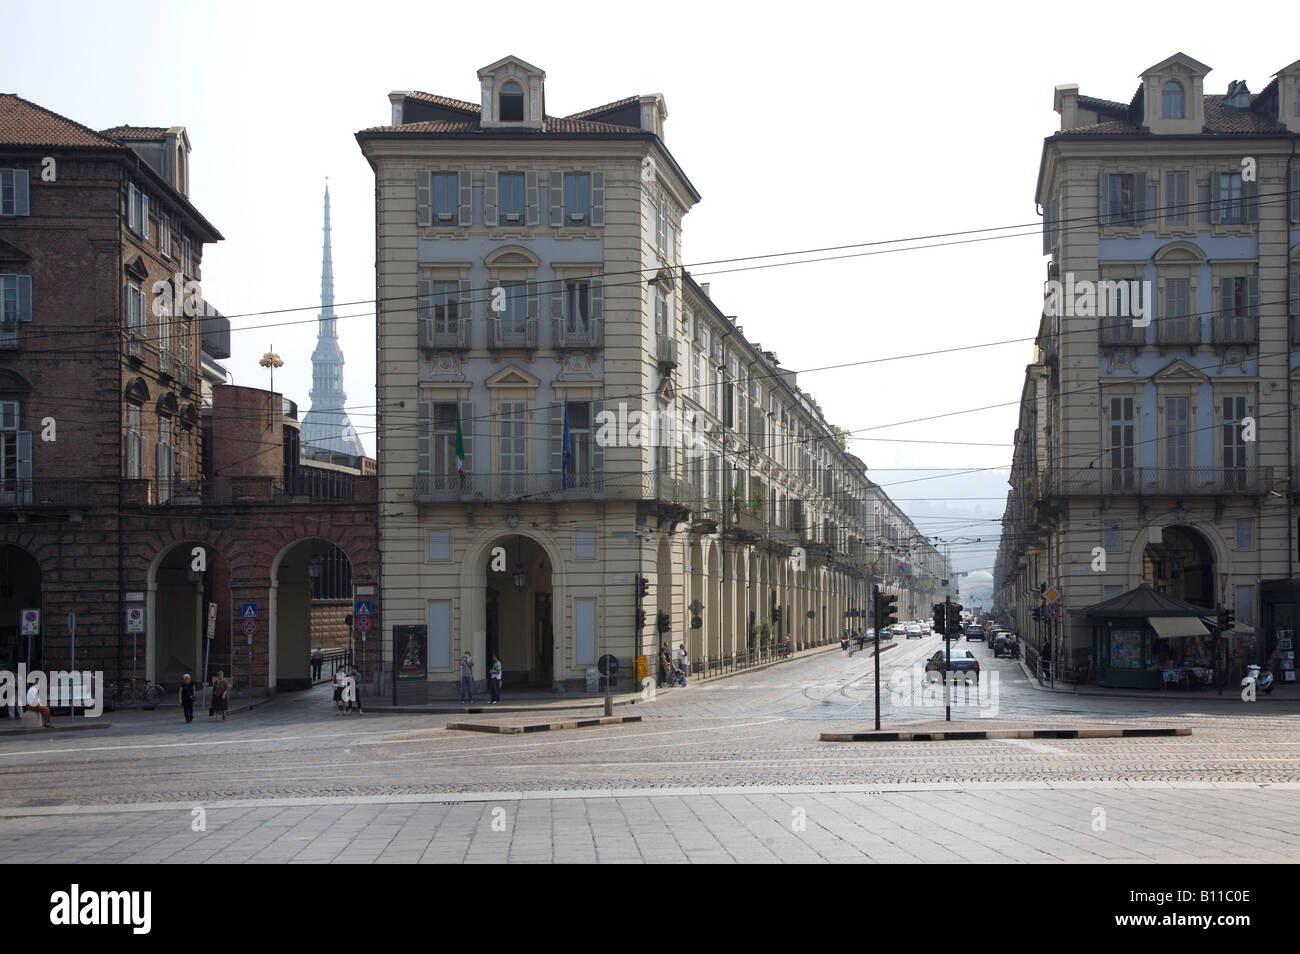 Turin, Via Po, links die Spitze der Mole Antonelliana - Stock Image